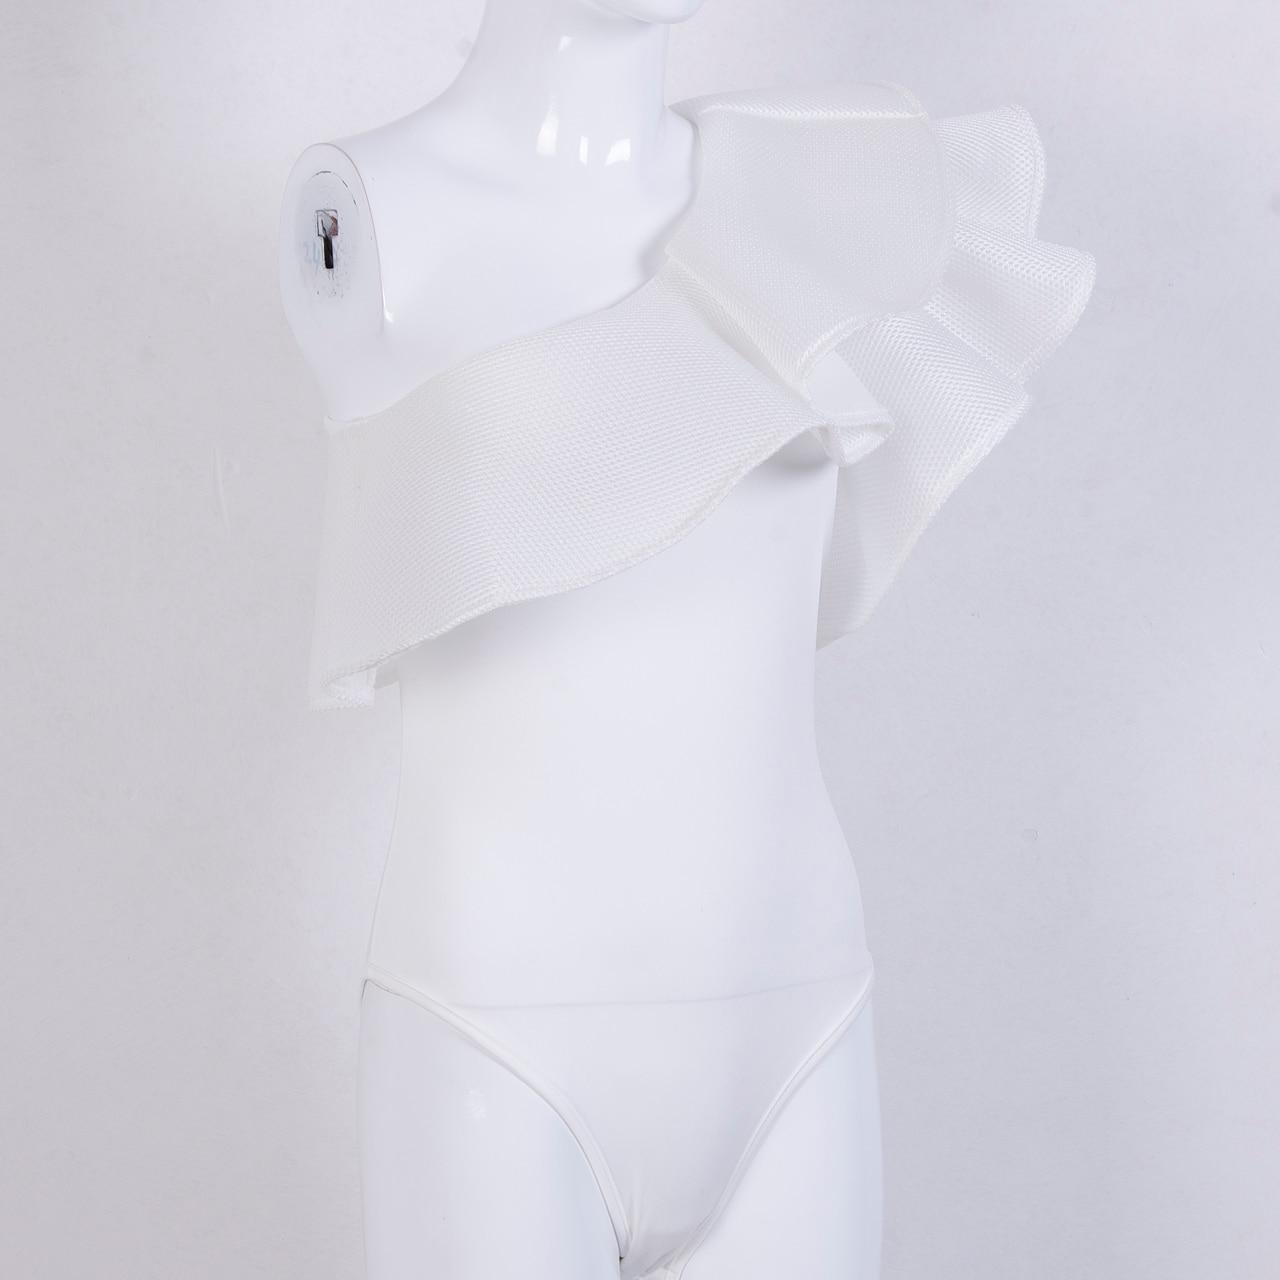 Women Sexy One Shoulder Ruffled Bodysuit Leotard Tops Romper Mesh Bodysuits-in  Bodysuits from Women s Clothing on Aliexpress.com  1f4d11931